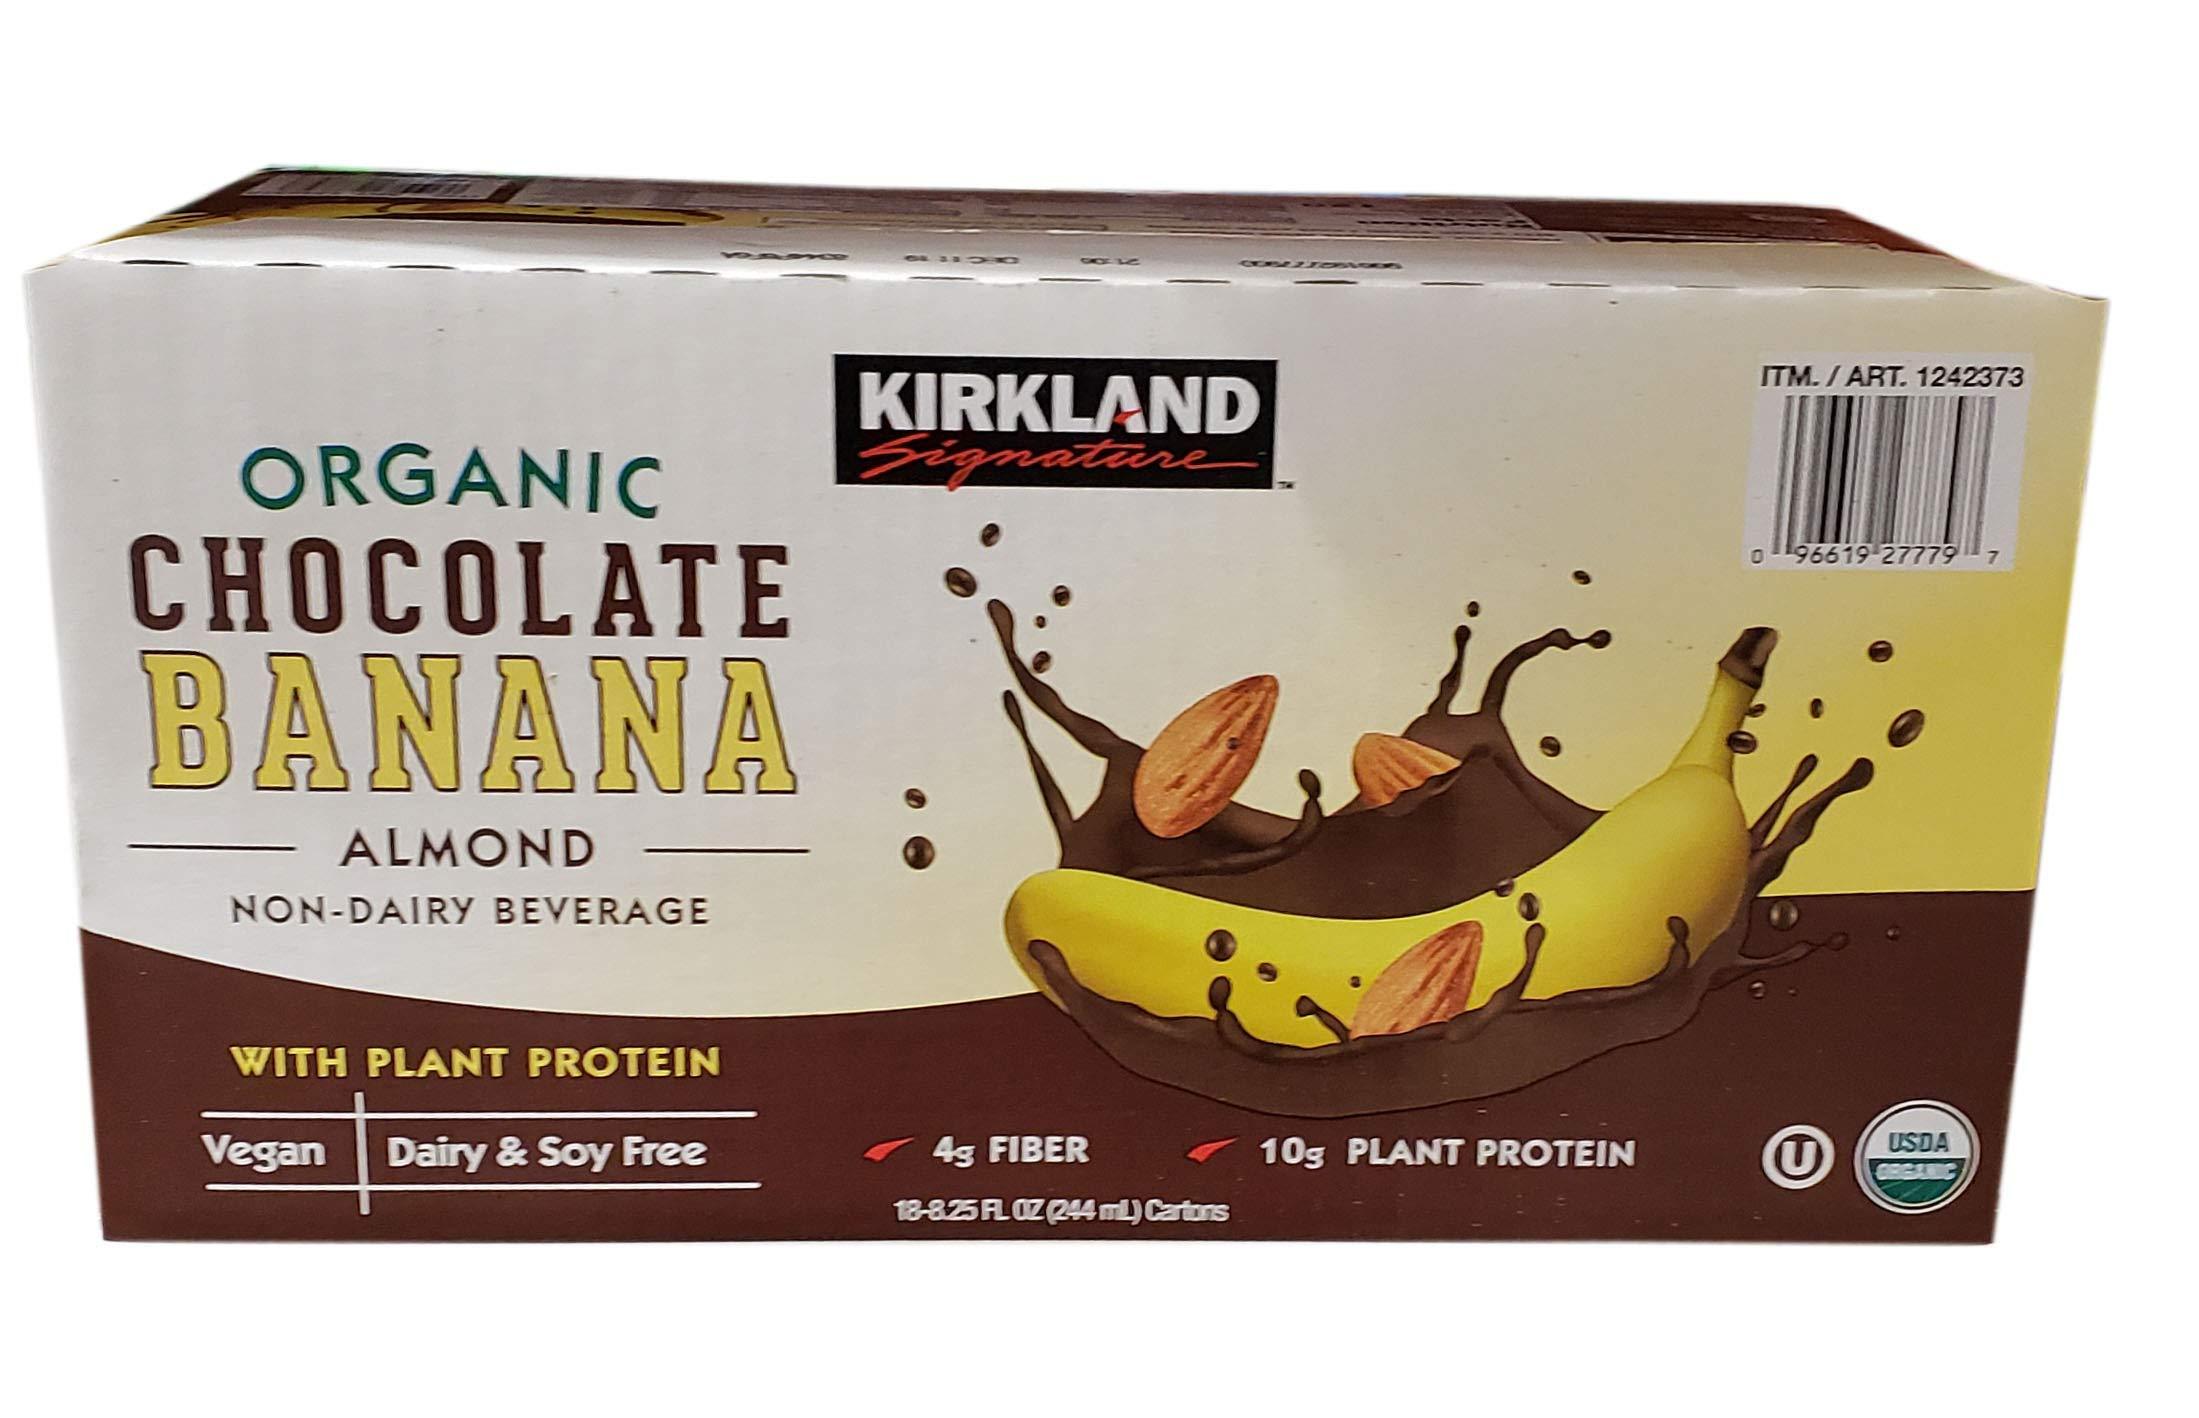 Kirkland Signature Organic Chocolate Banana Almond